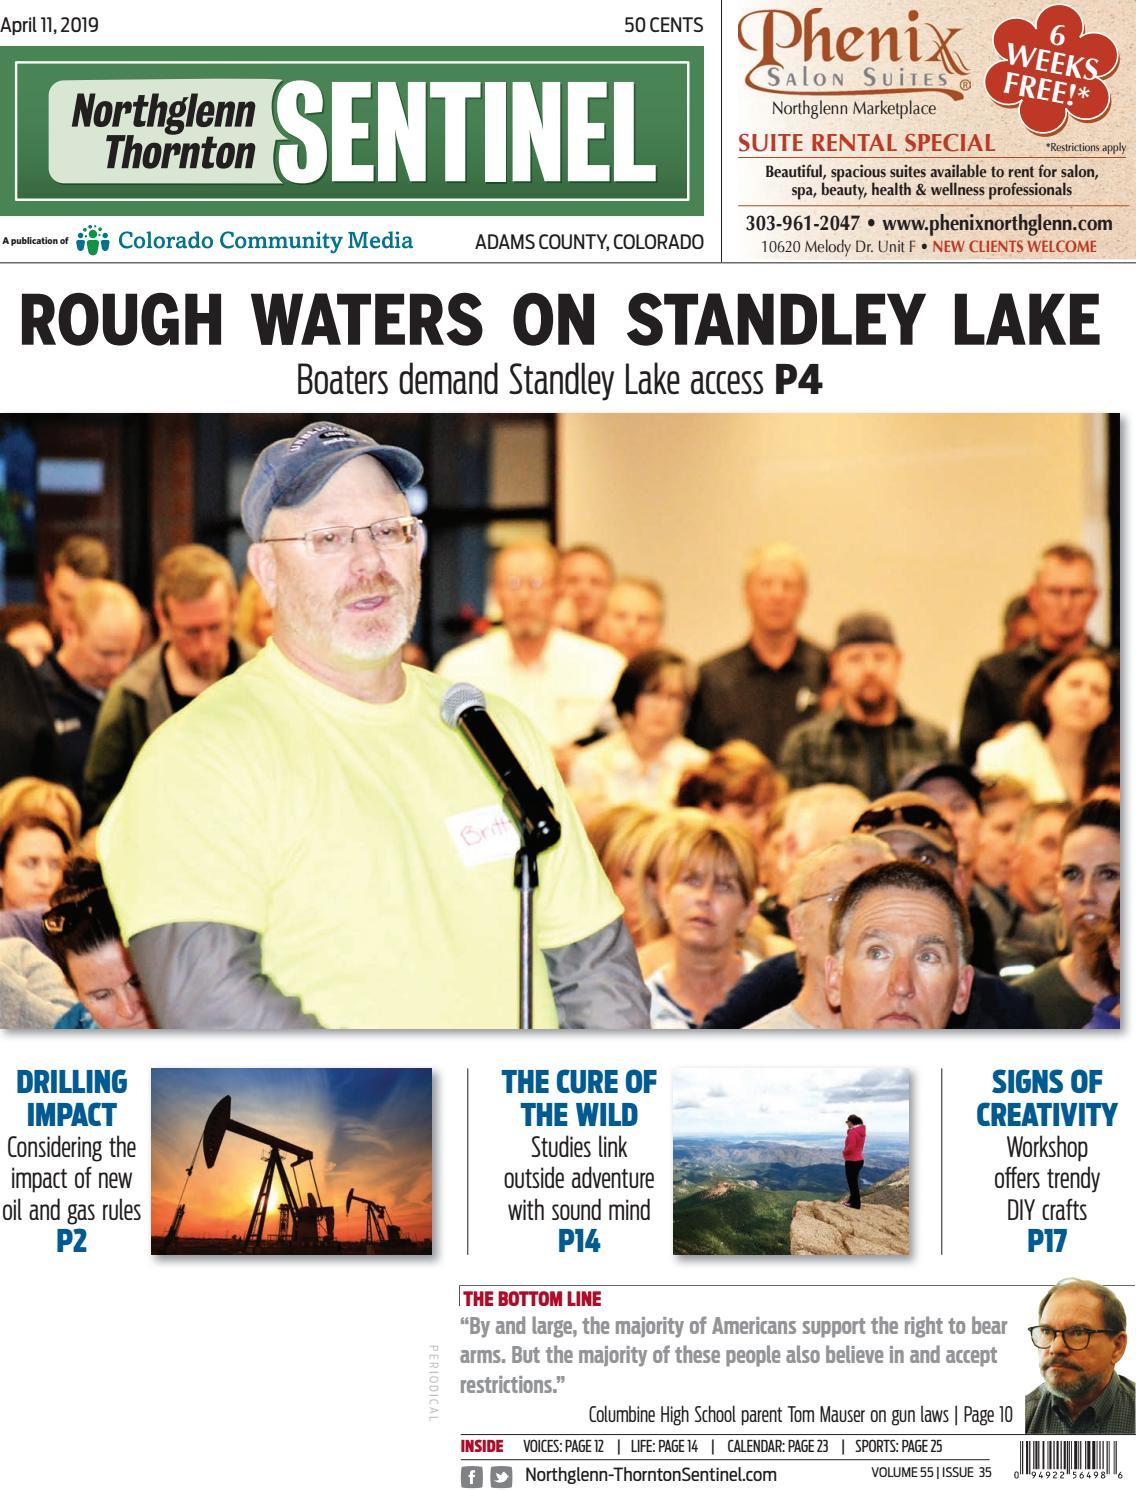 Northglenn Thornton Sentinel 0411 by Colorado Community Media - issuu